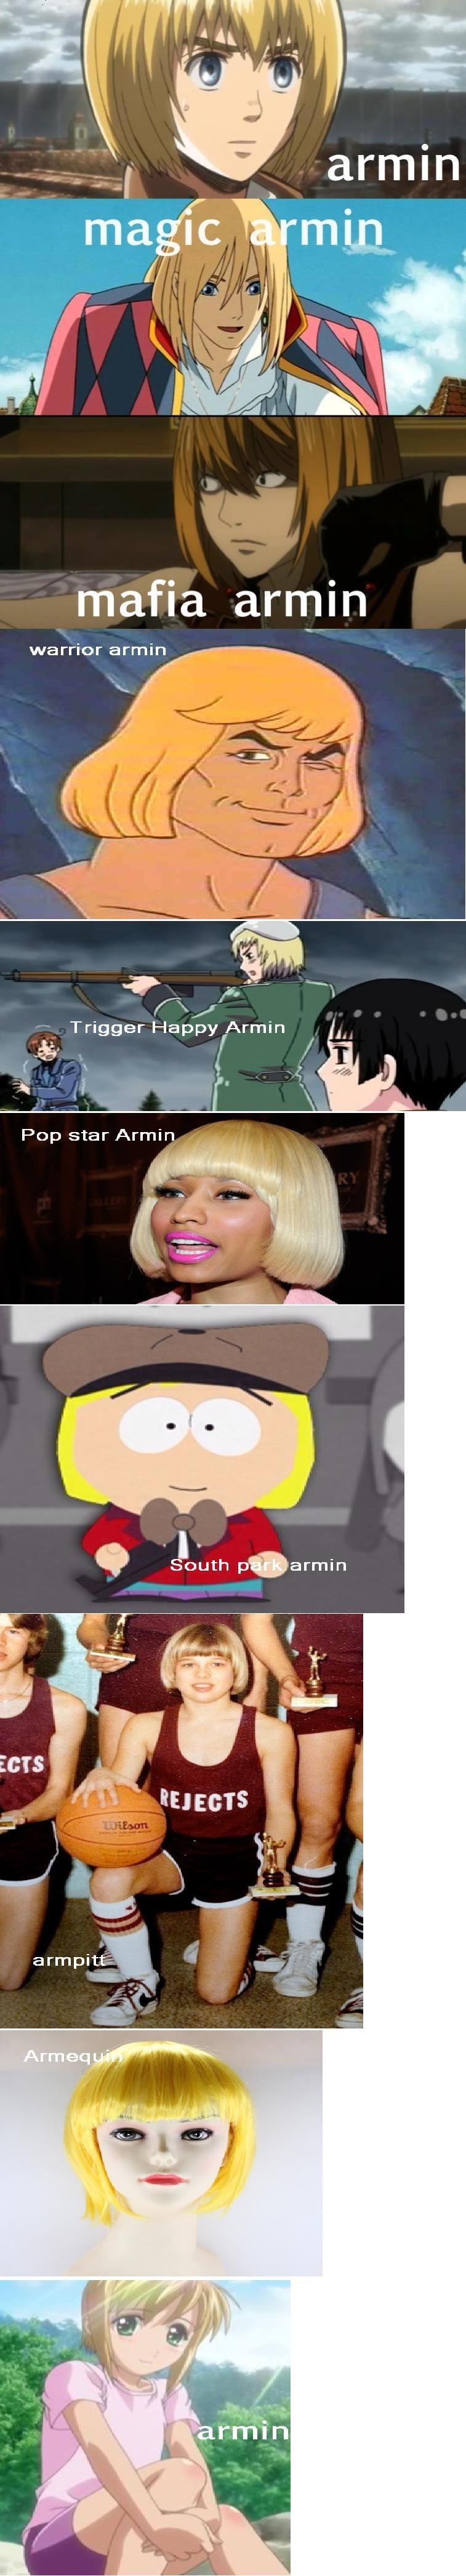 Armin. Credits to Tumblr.. min. mafia armin warrior armin. Armint Armin Credits to Tumblr min mafia armin warrior Armint